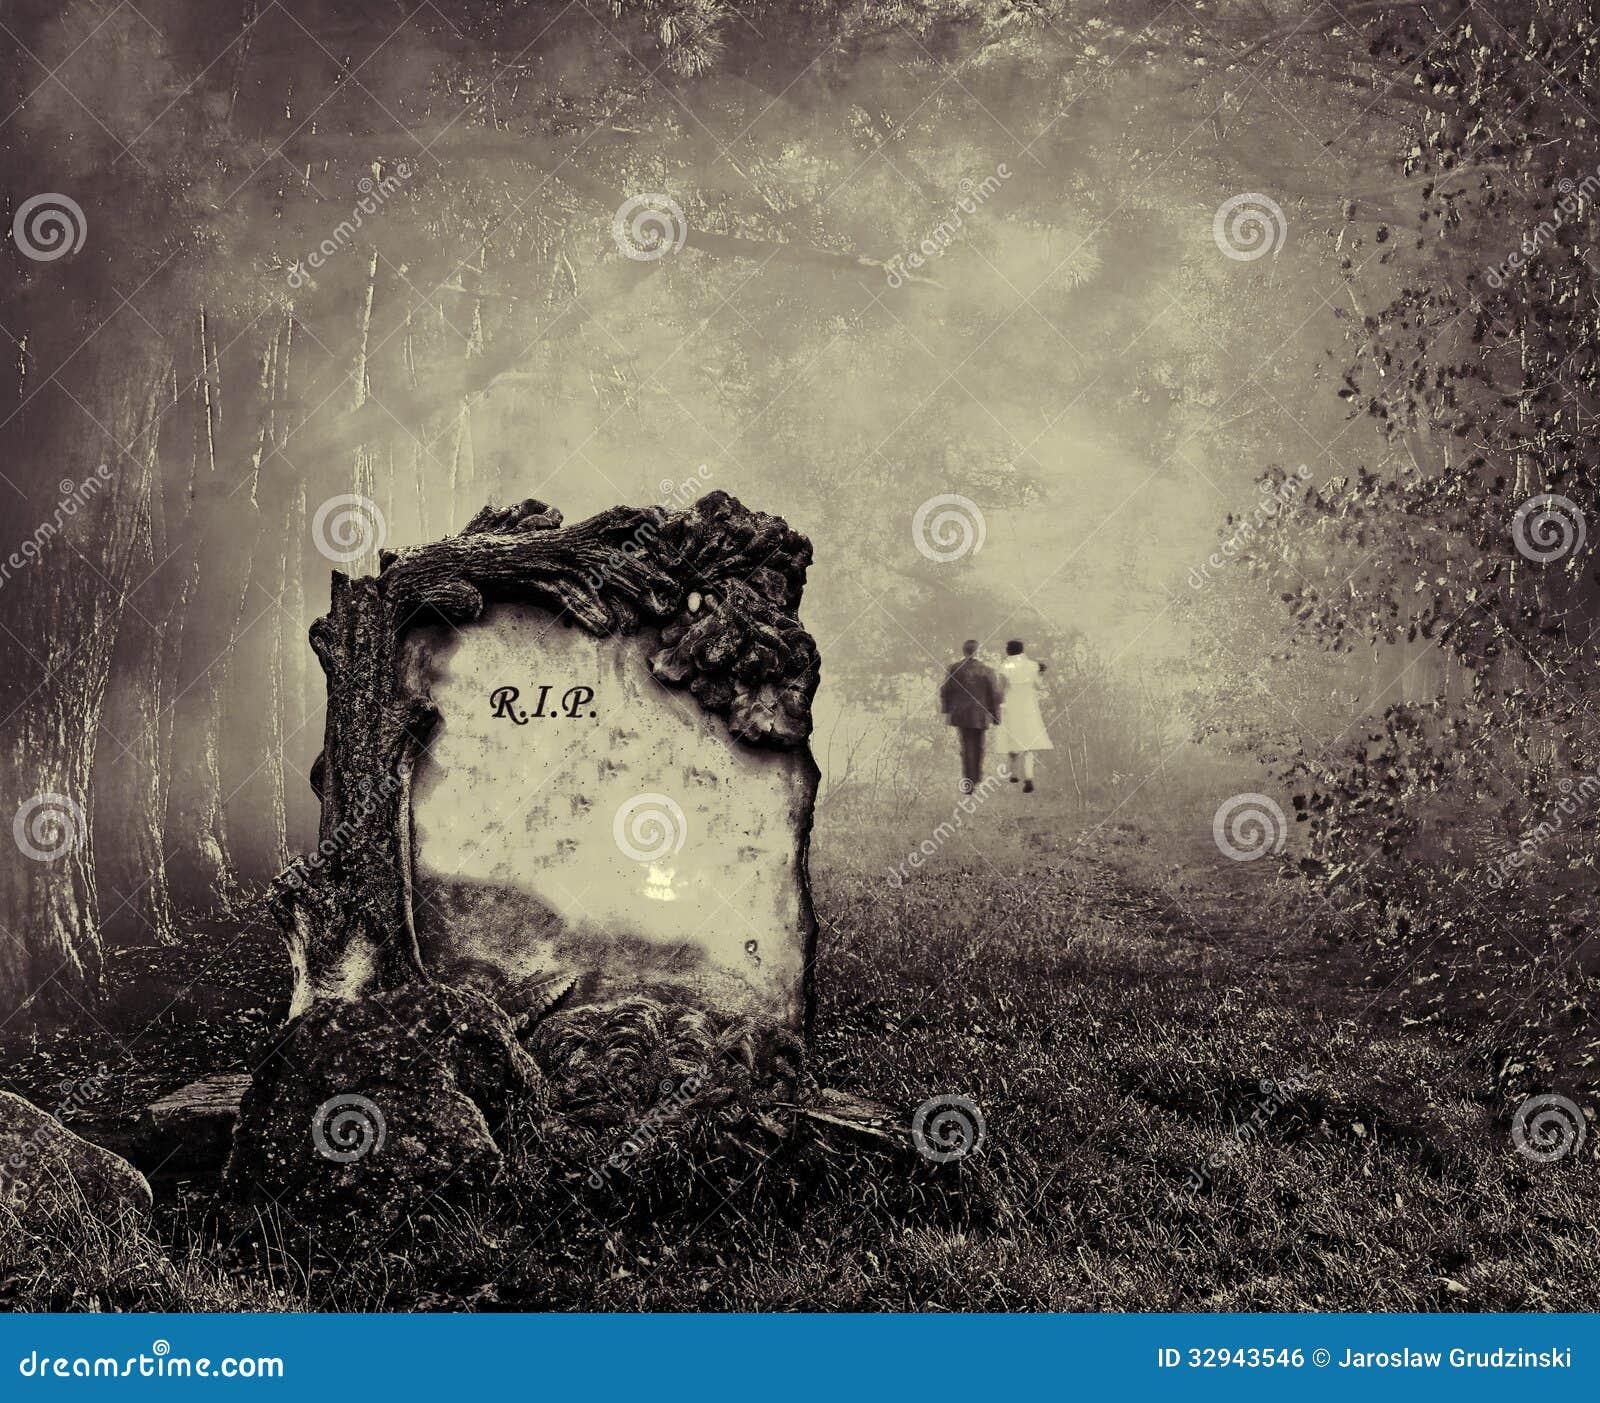 Tombe dans une forêt